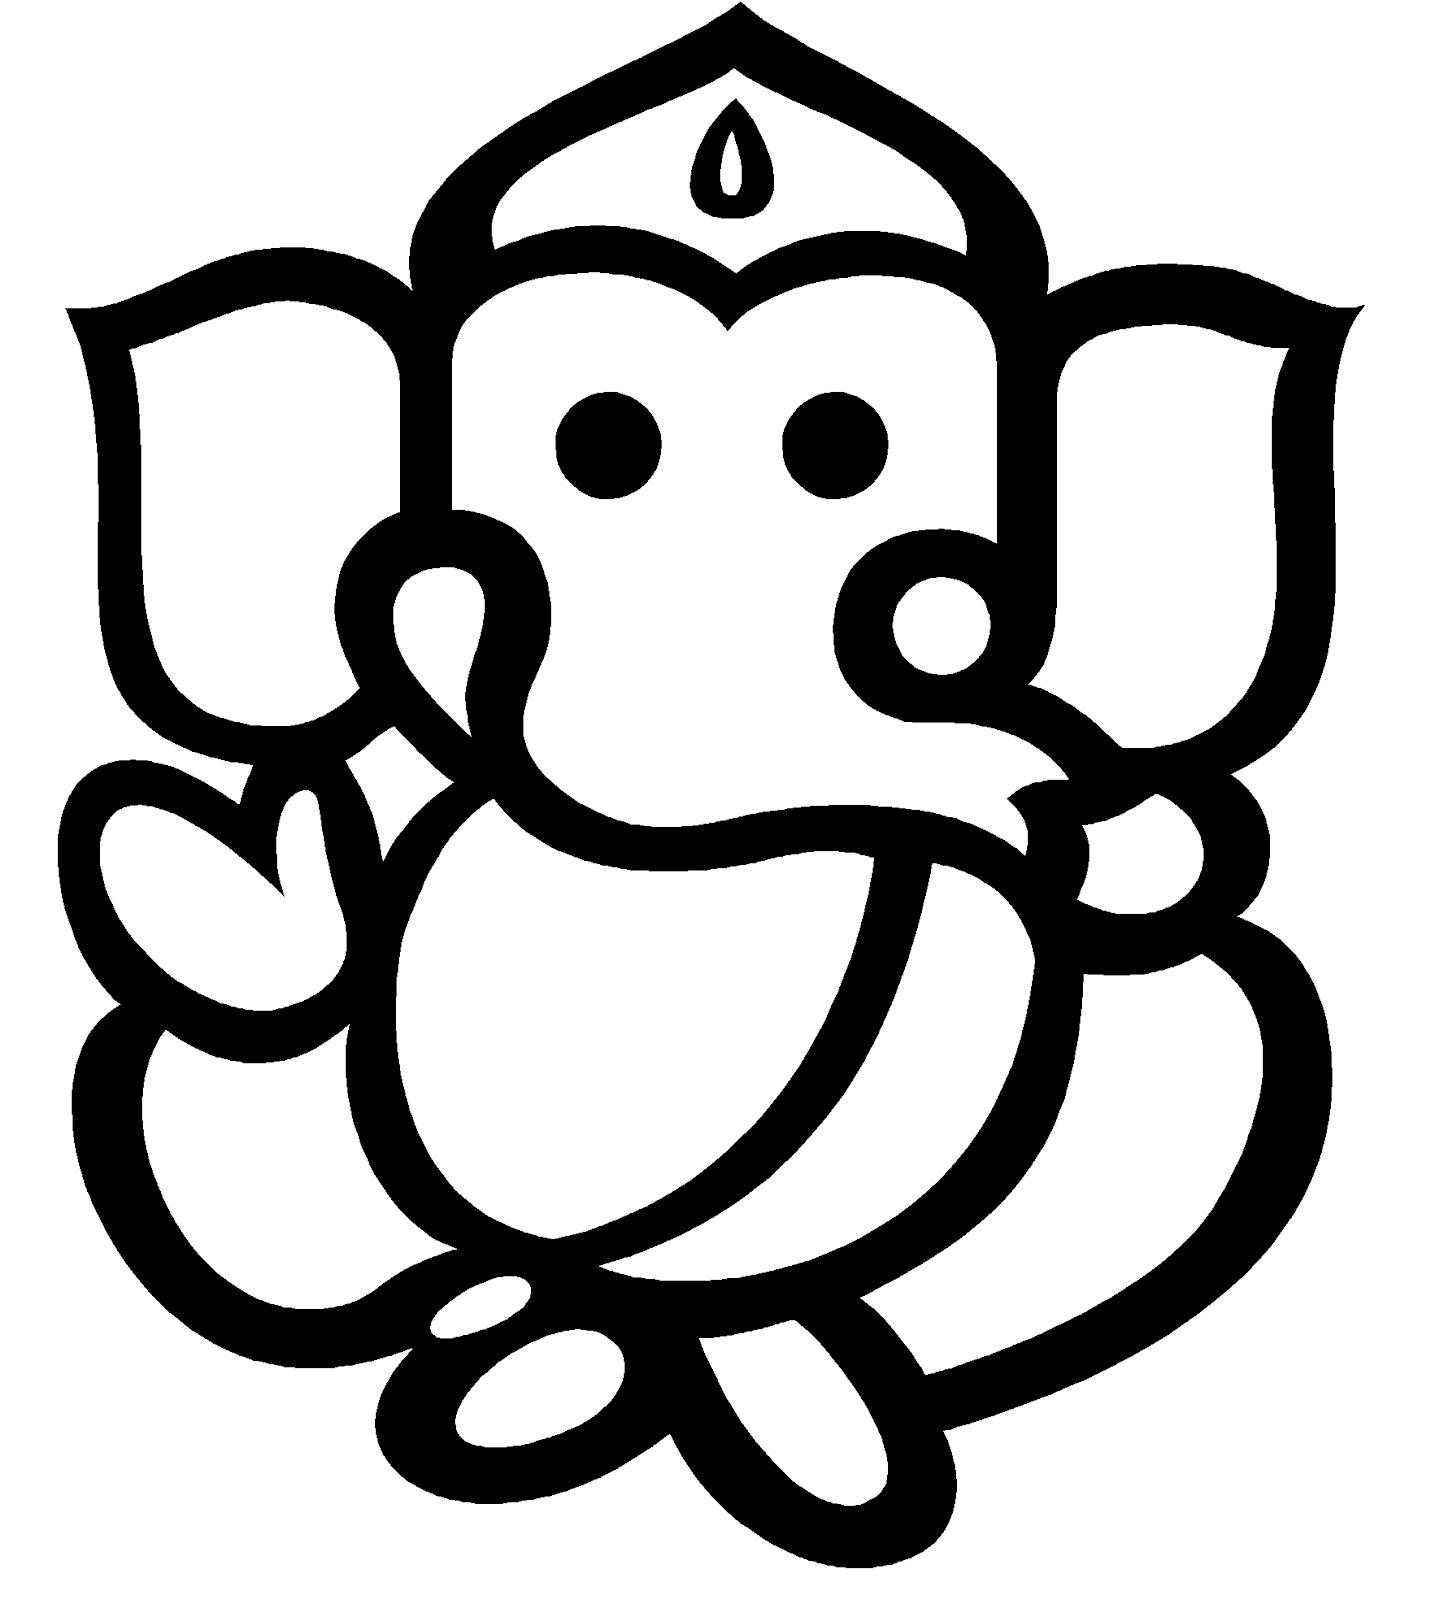 Line Art Of Lord Ganesha : Ganesh line art clipart best